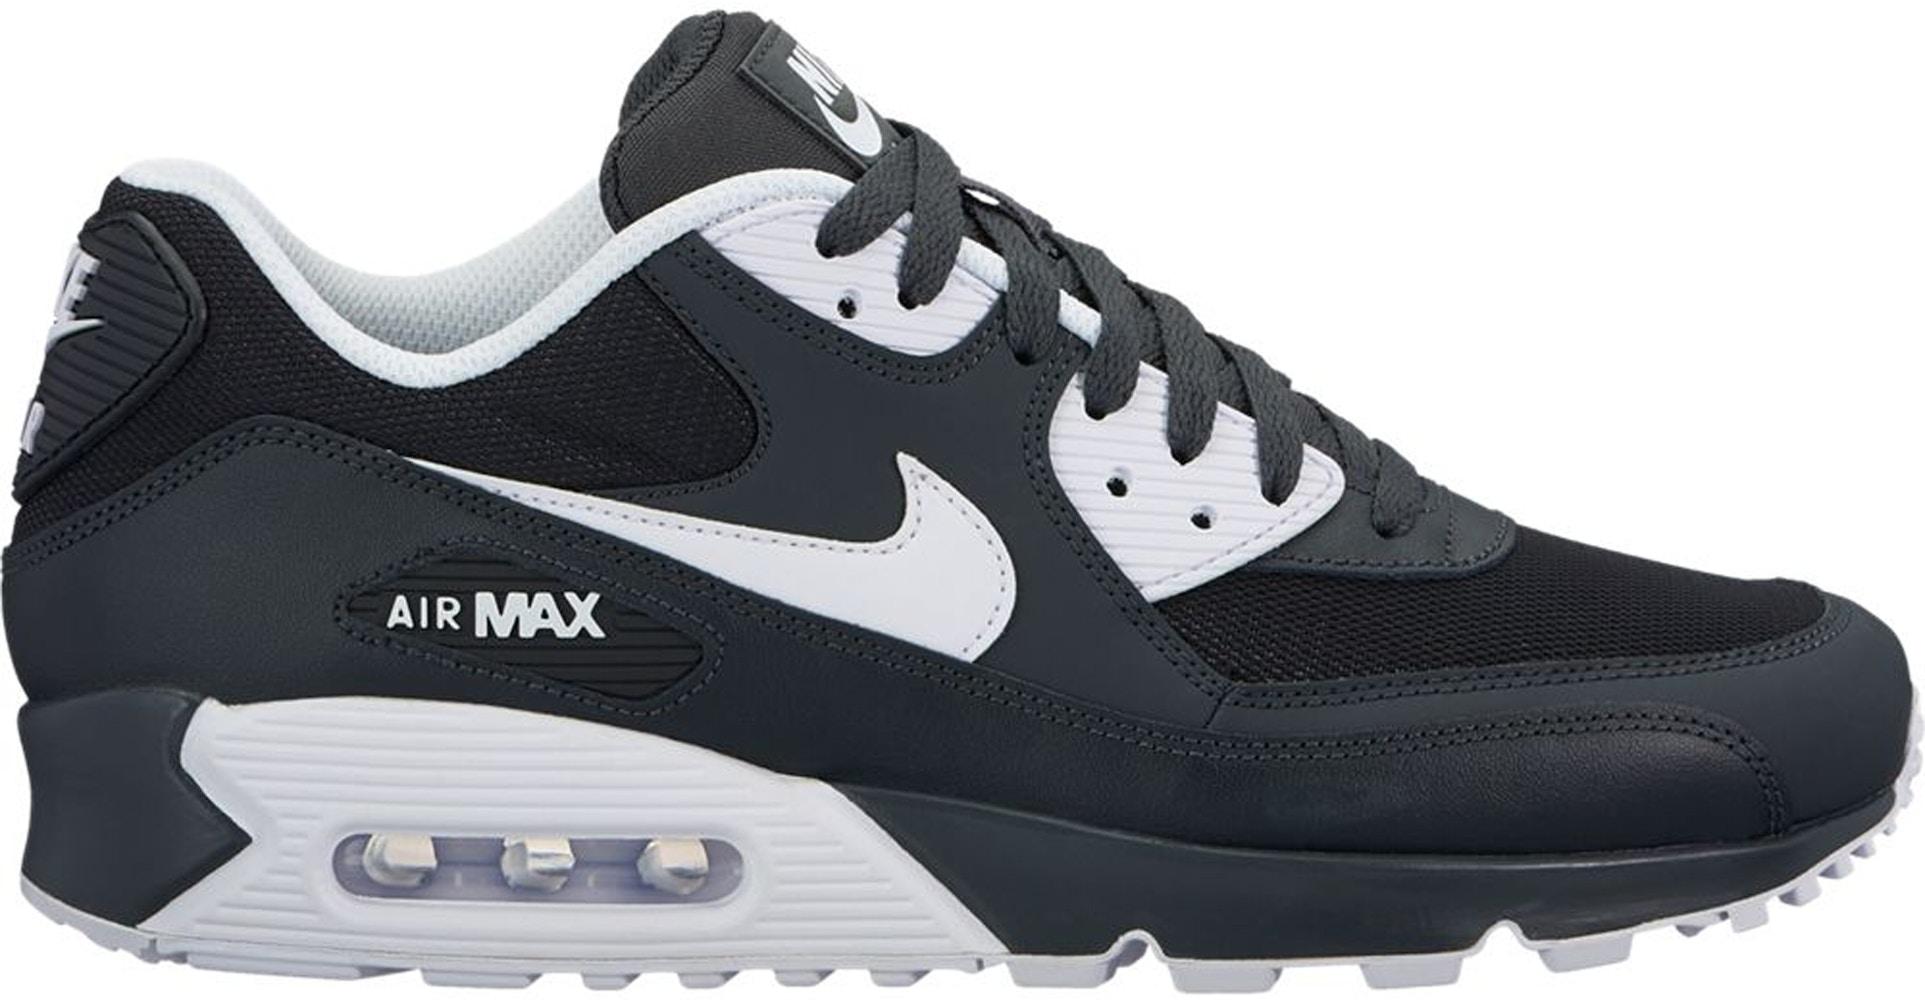 Nike Air Max 90 Black White (2018) - 537384-089